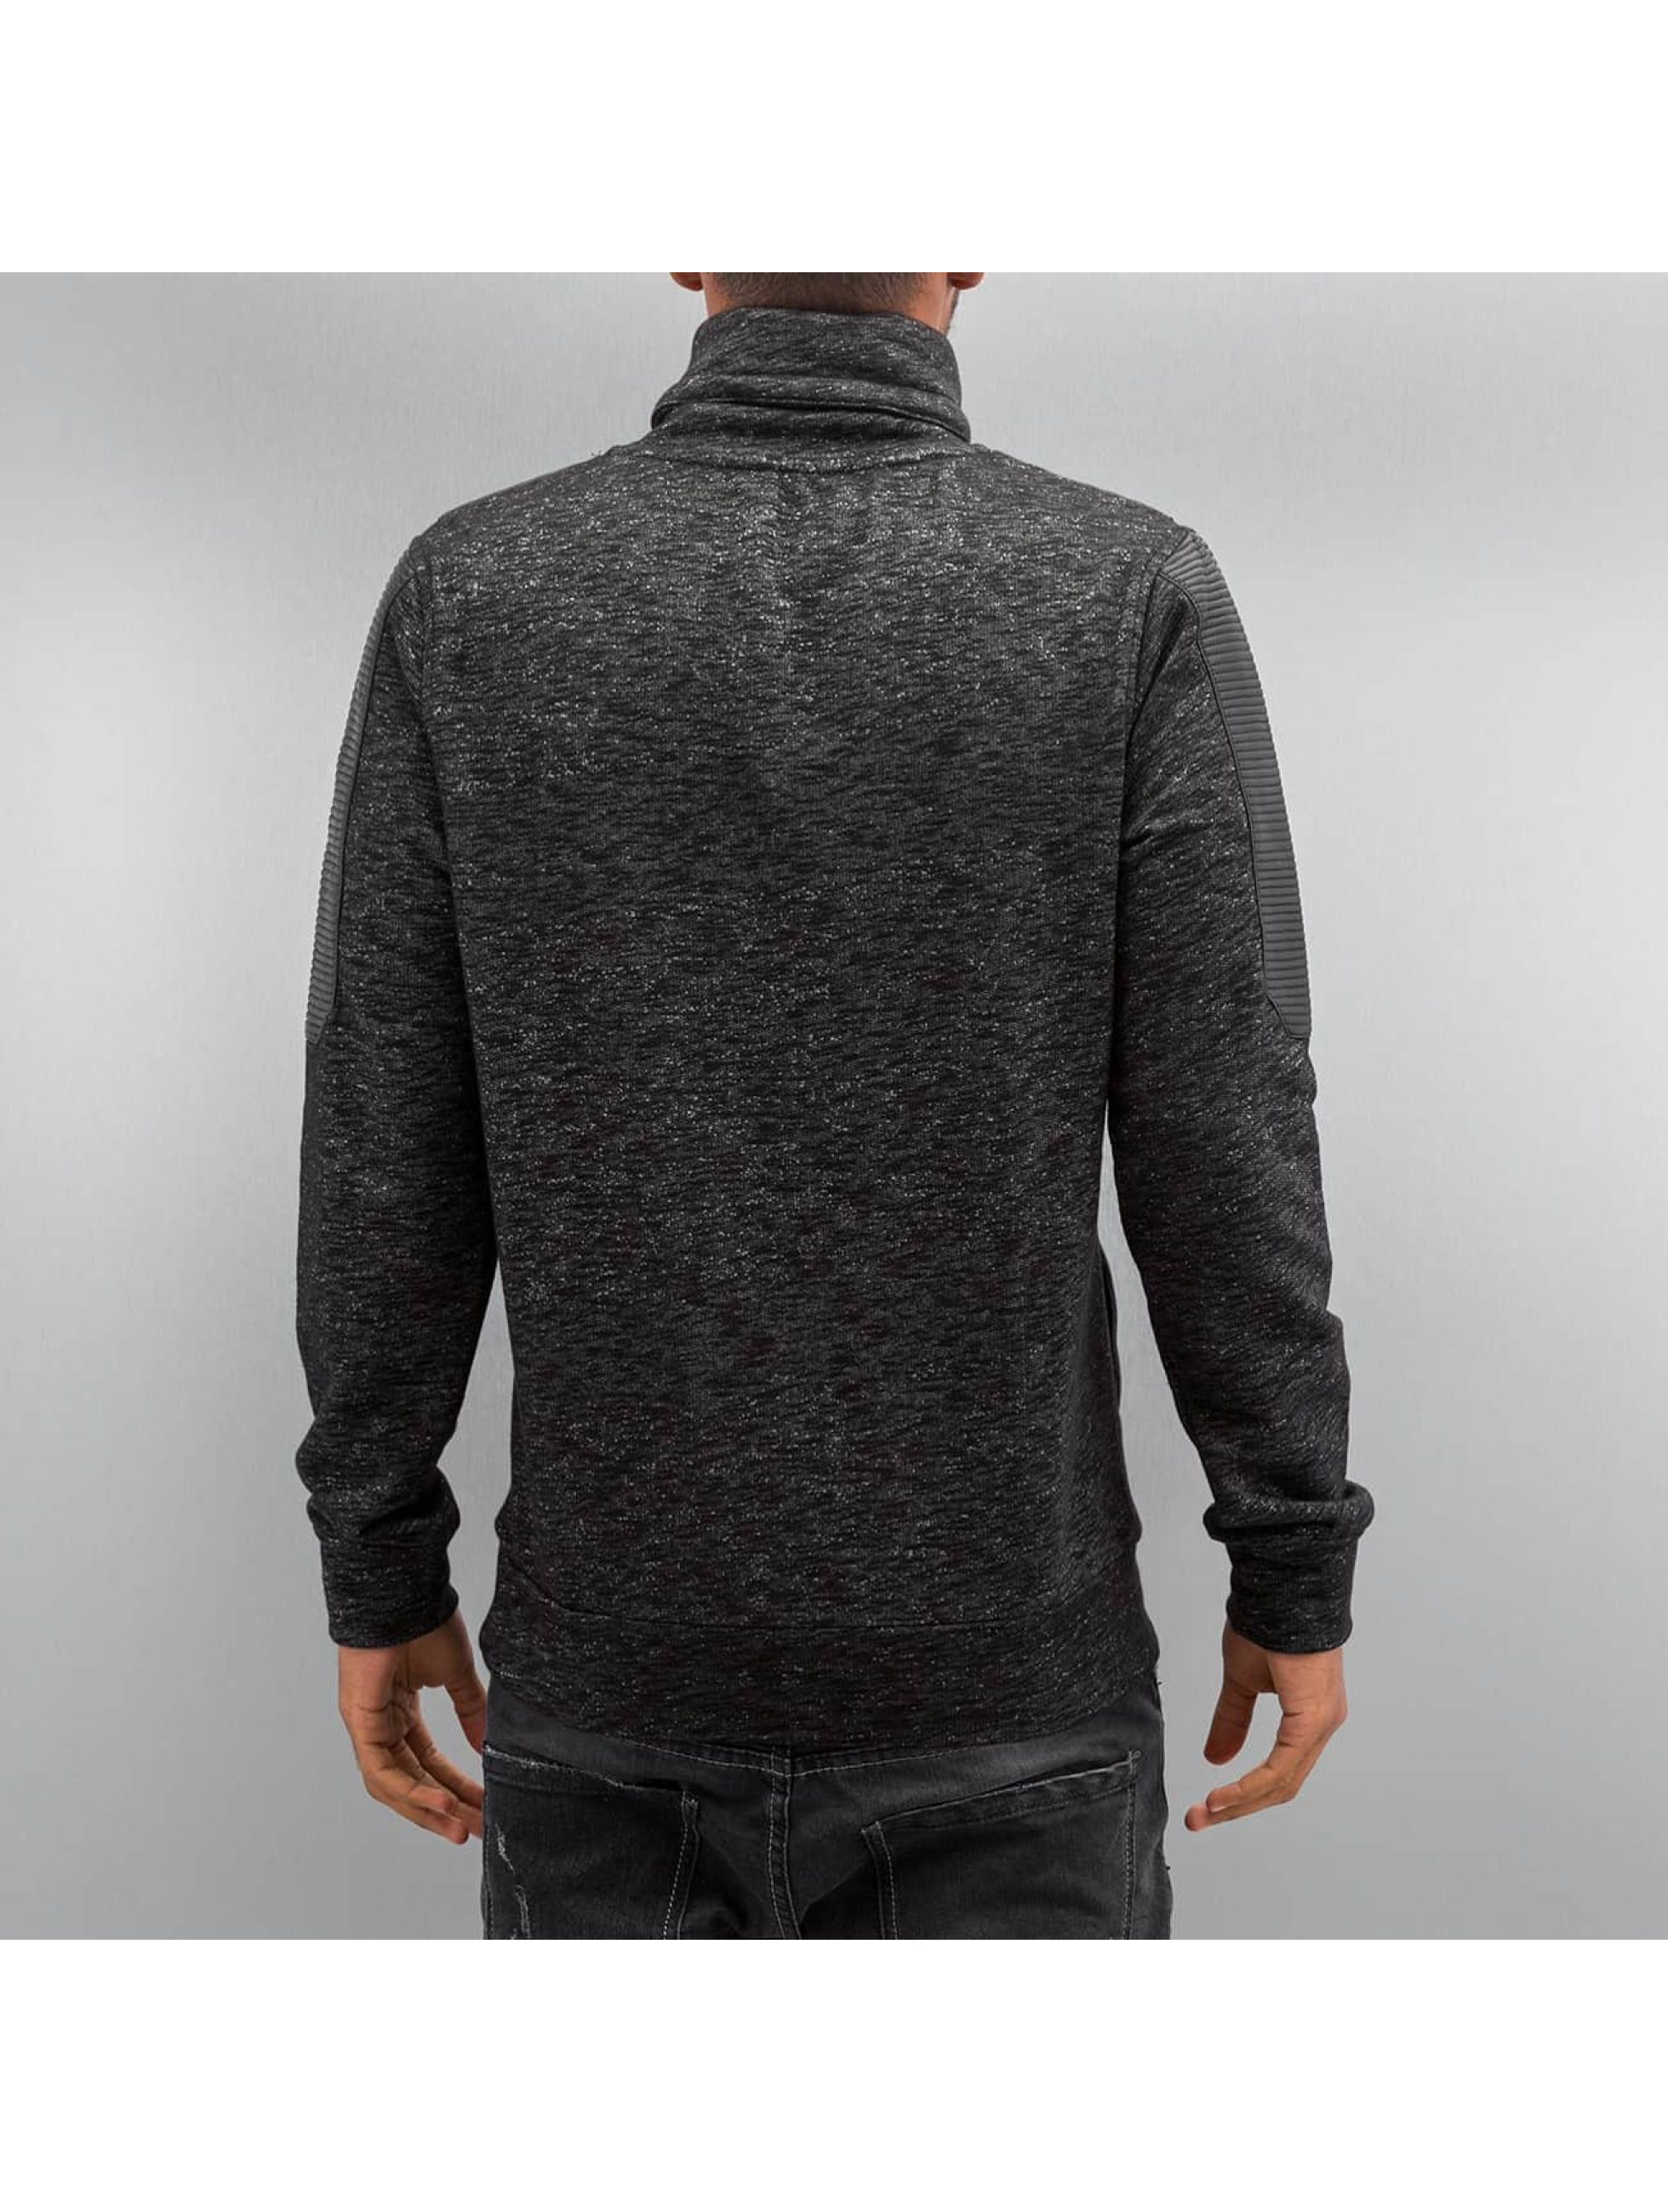 Cipo & Baxx Пуловер Tube черный